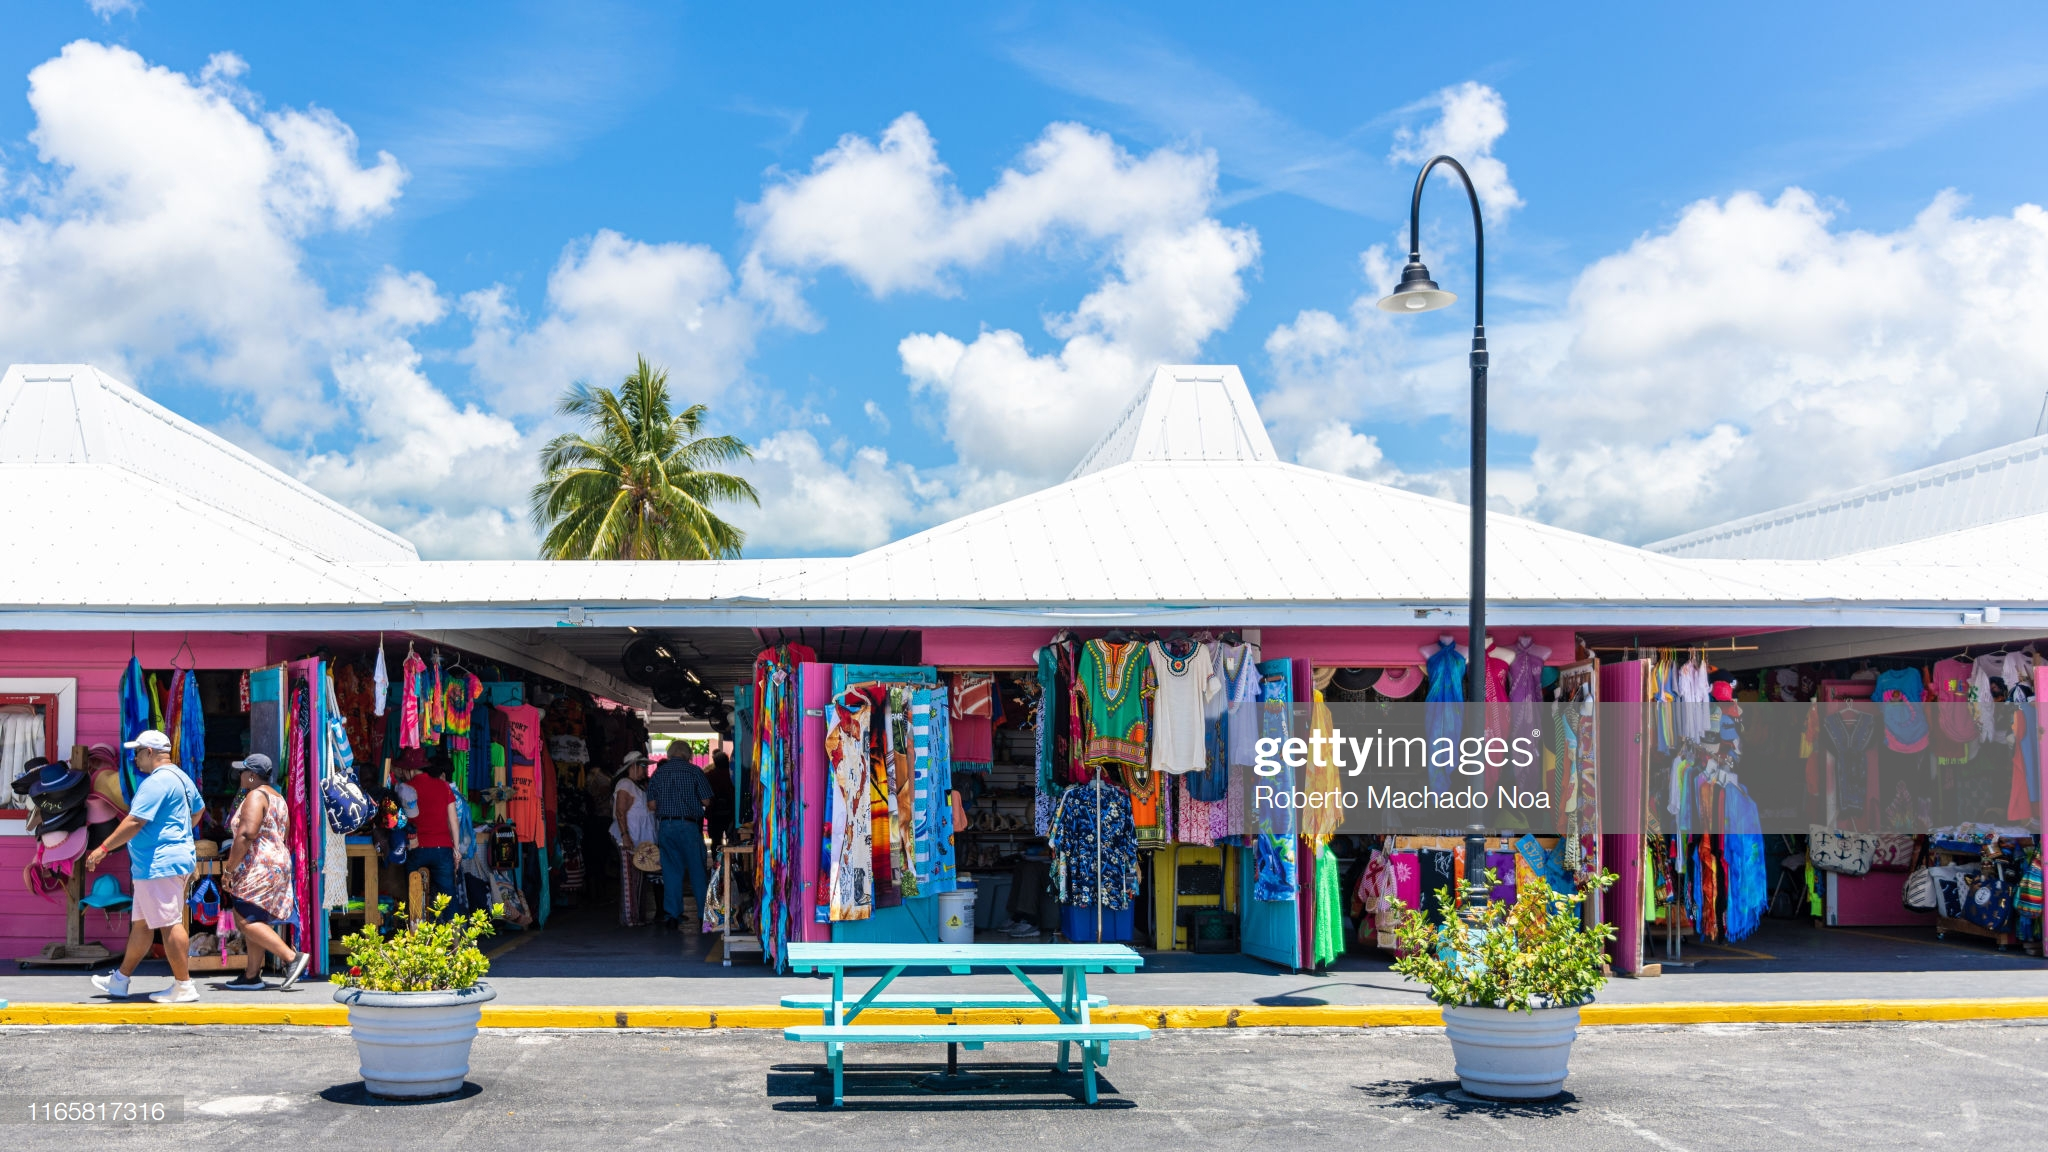 Supporting Micro, Small And Medium Enterprises, The Backbone Of Caribbean Economies